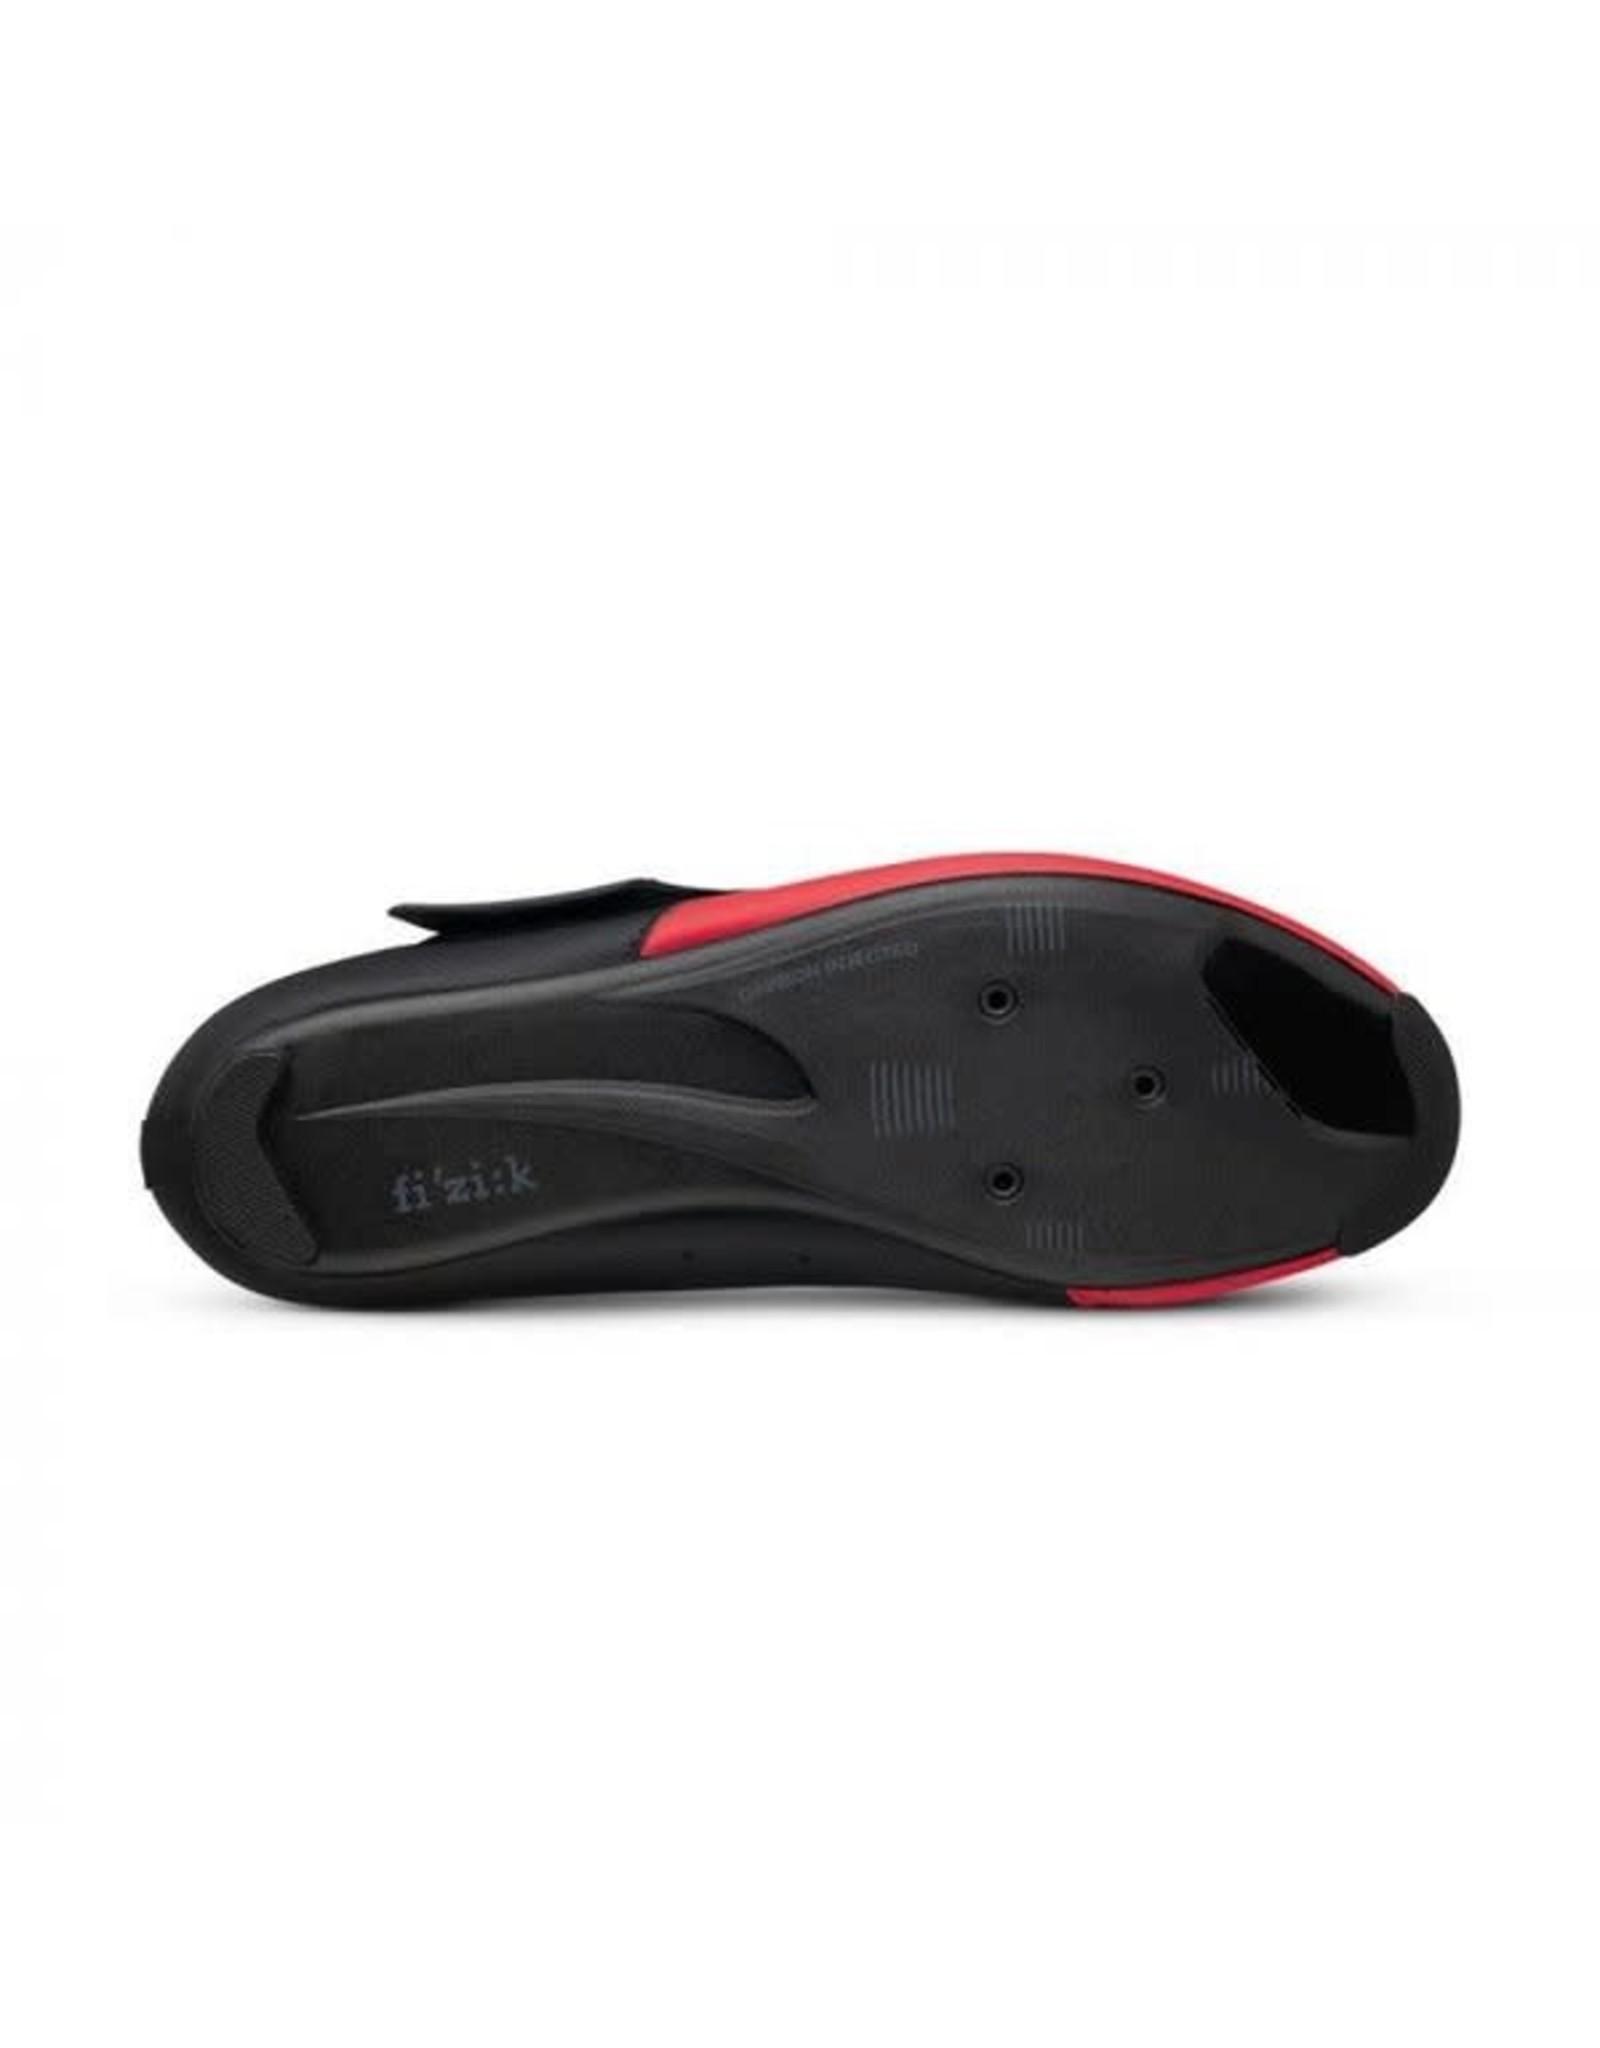 Chaussures Fizik triathlon Transiro Powerstrap R4